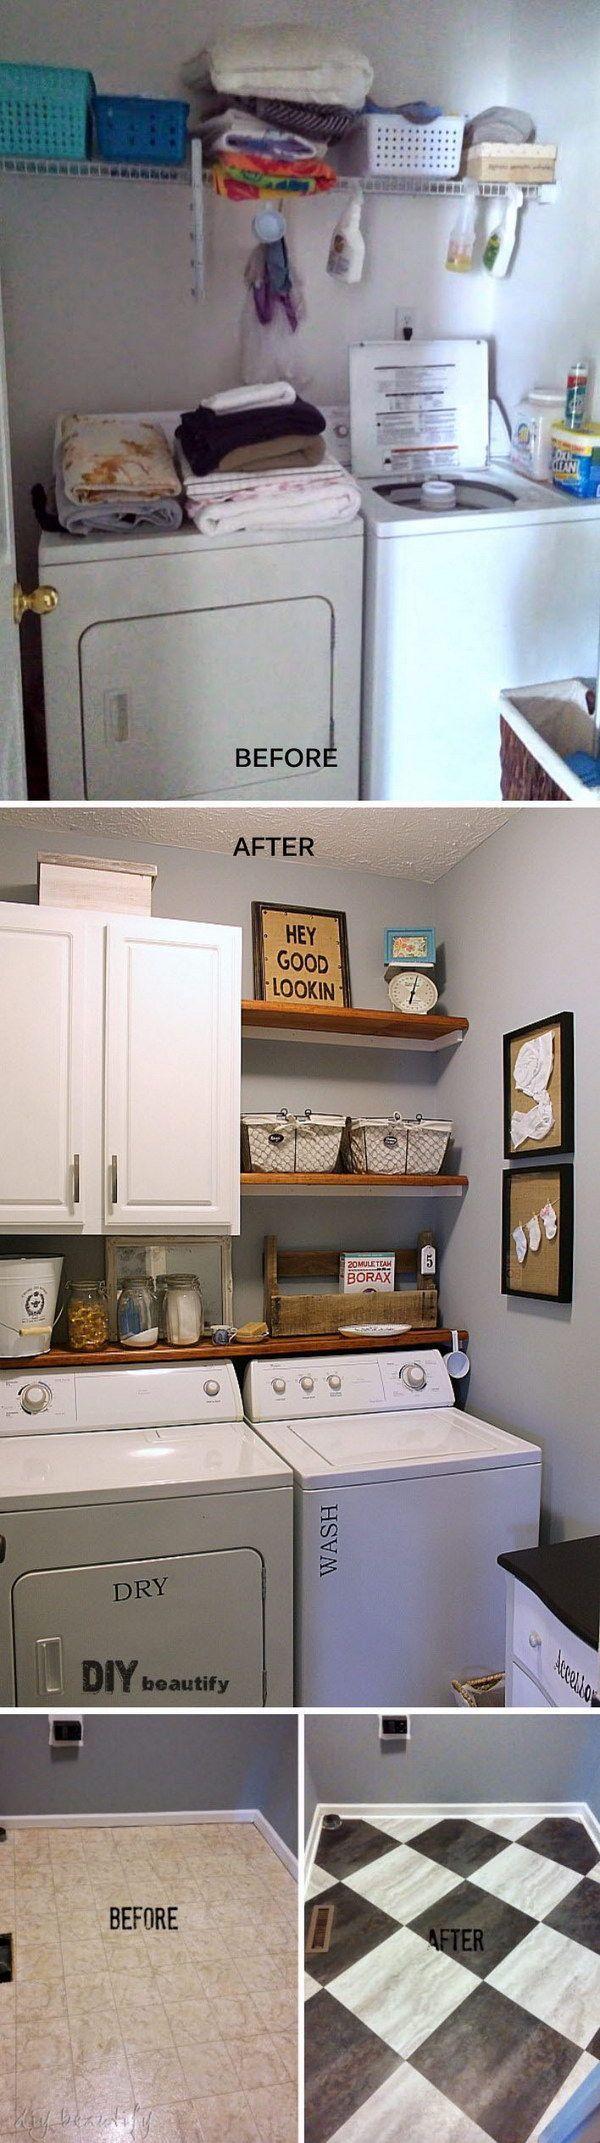 Best 25+ Laundry room design ideas on Pinterest | Laundry design ...